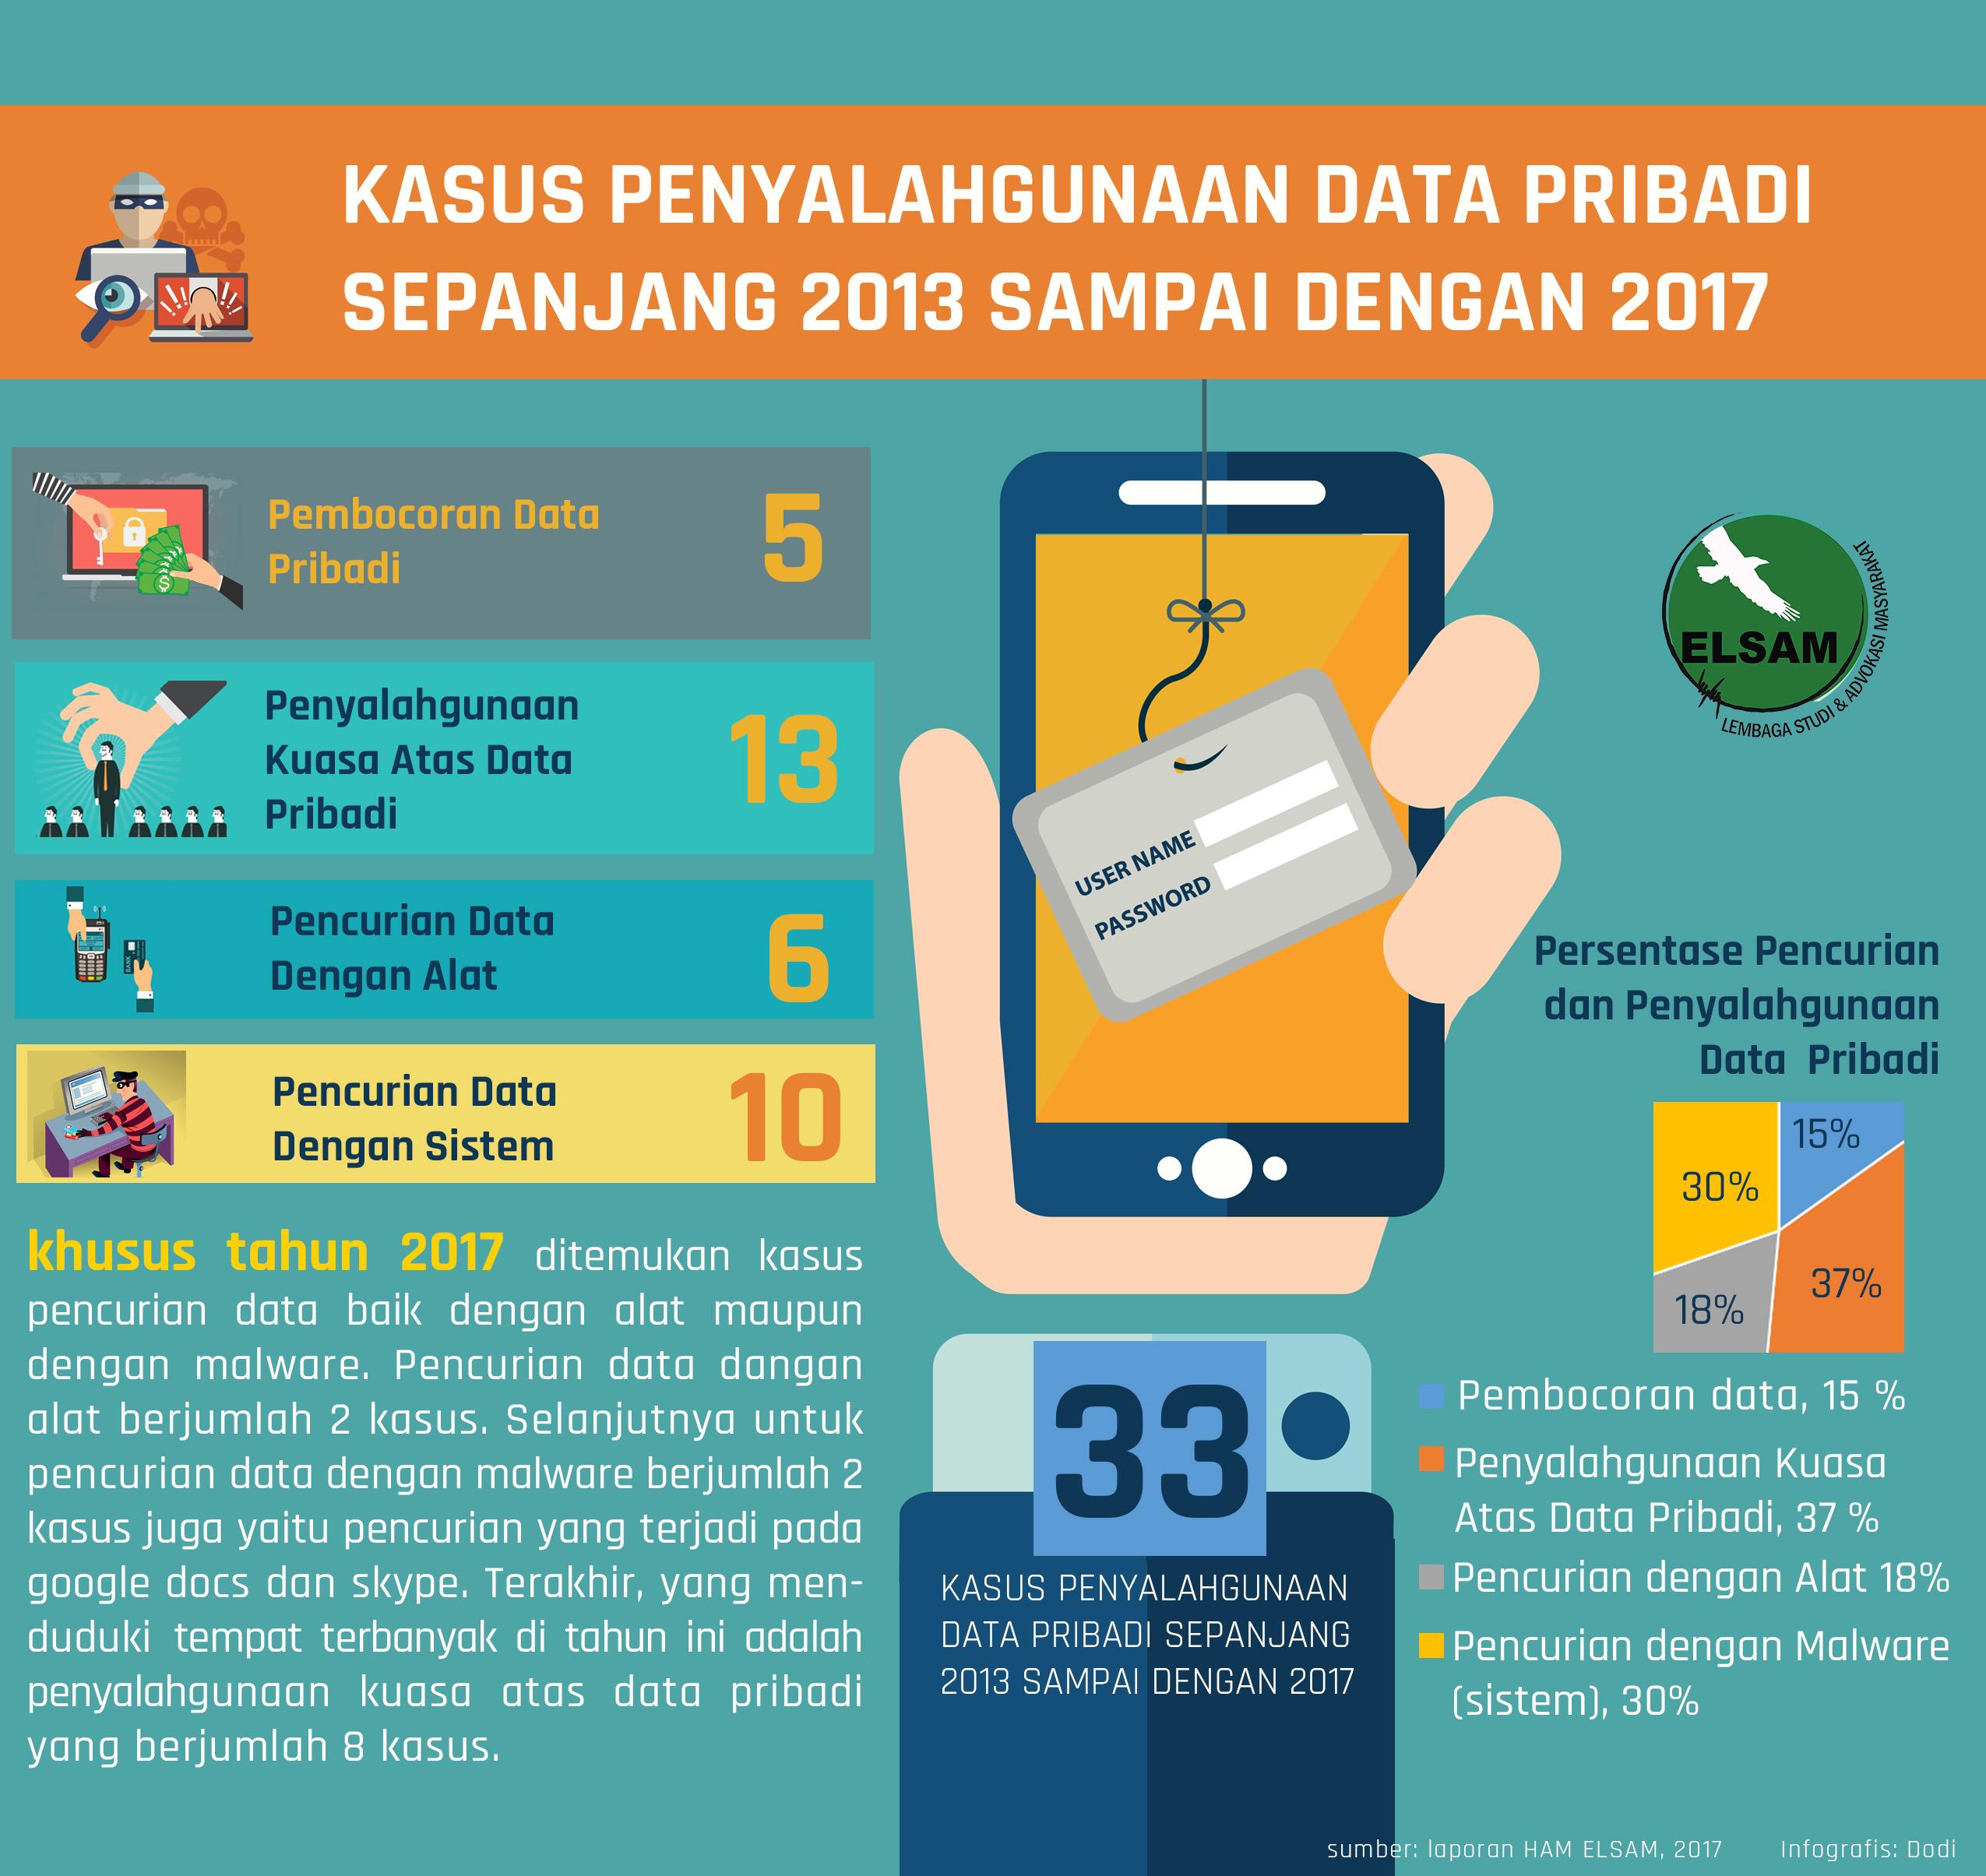 Kasus Penyalahgunaan Data Pribadi Sepanjang 2013-2017